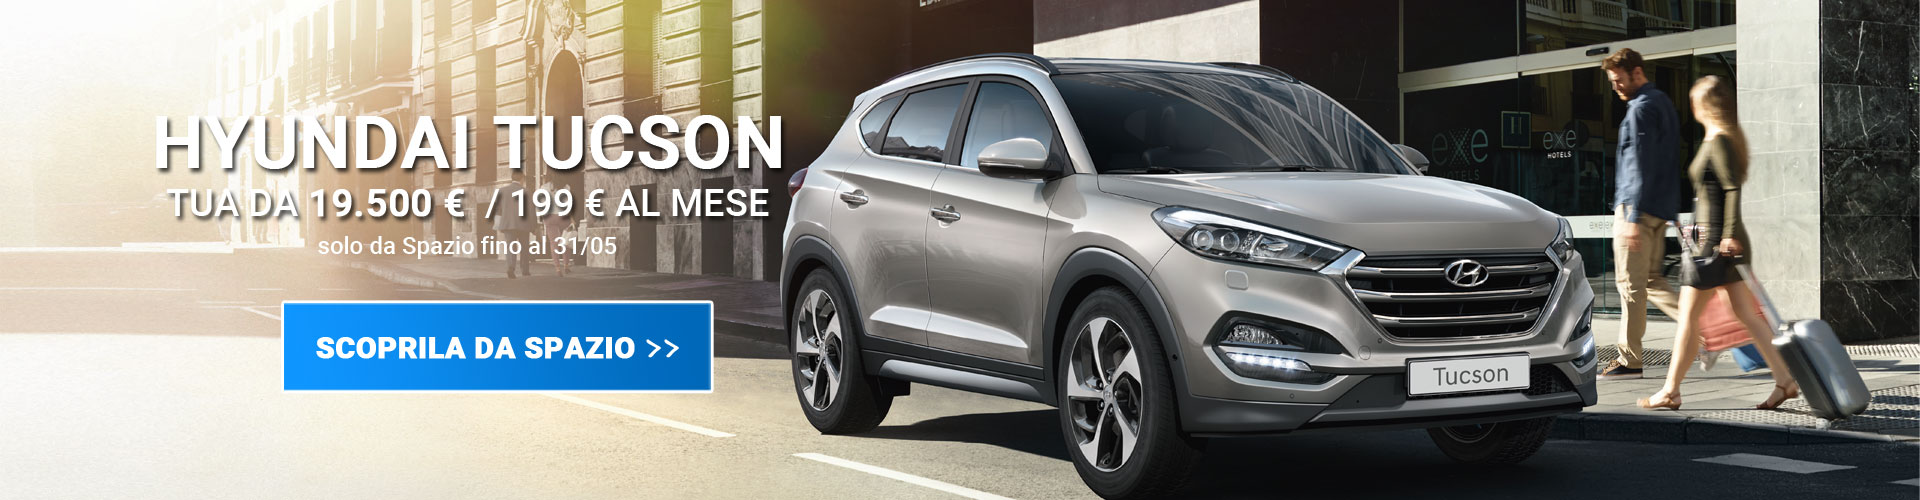 Hyundai Tucson da Spazio a Torino